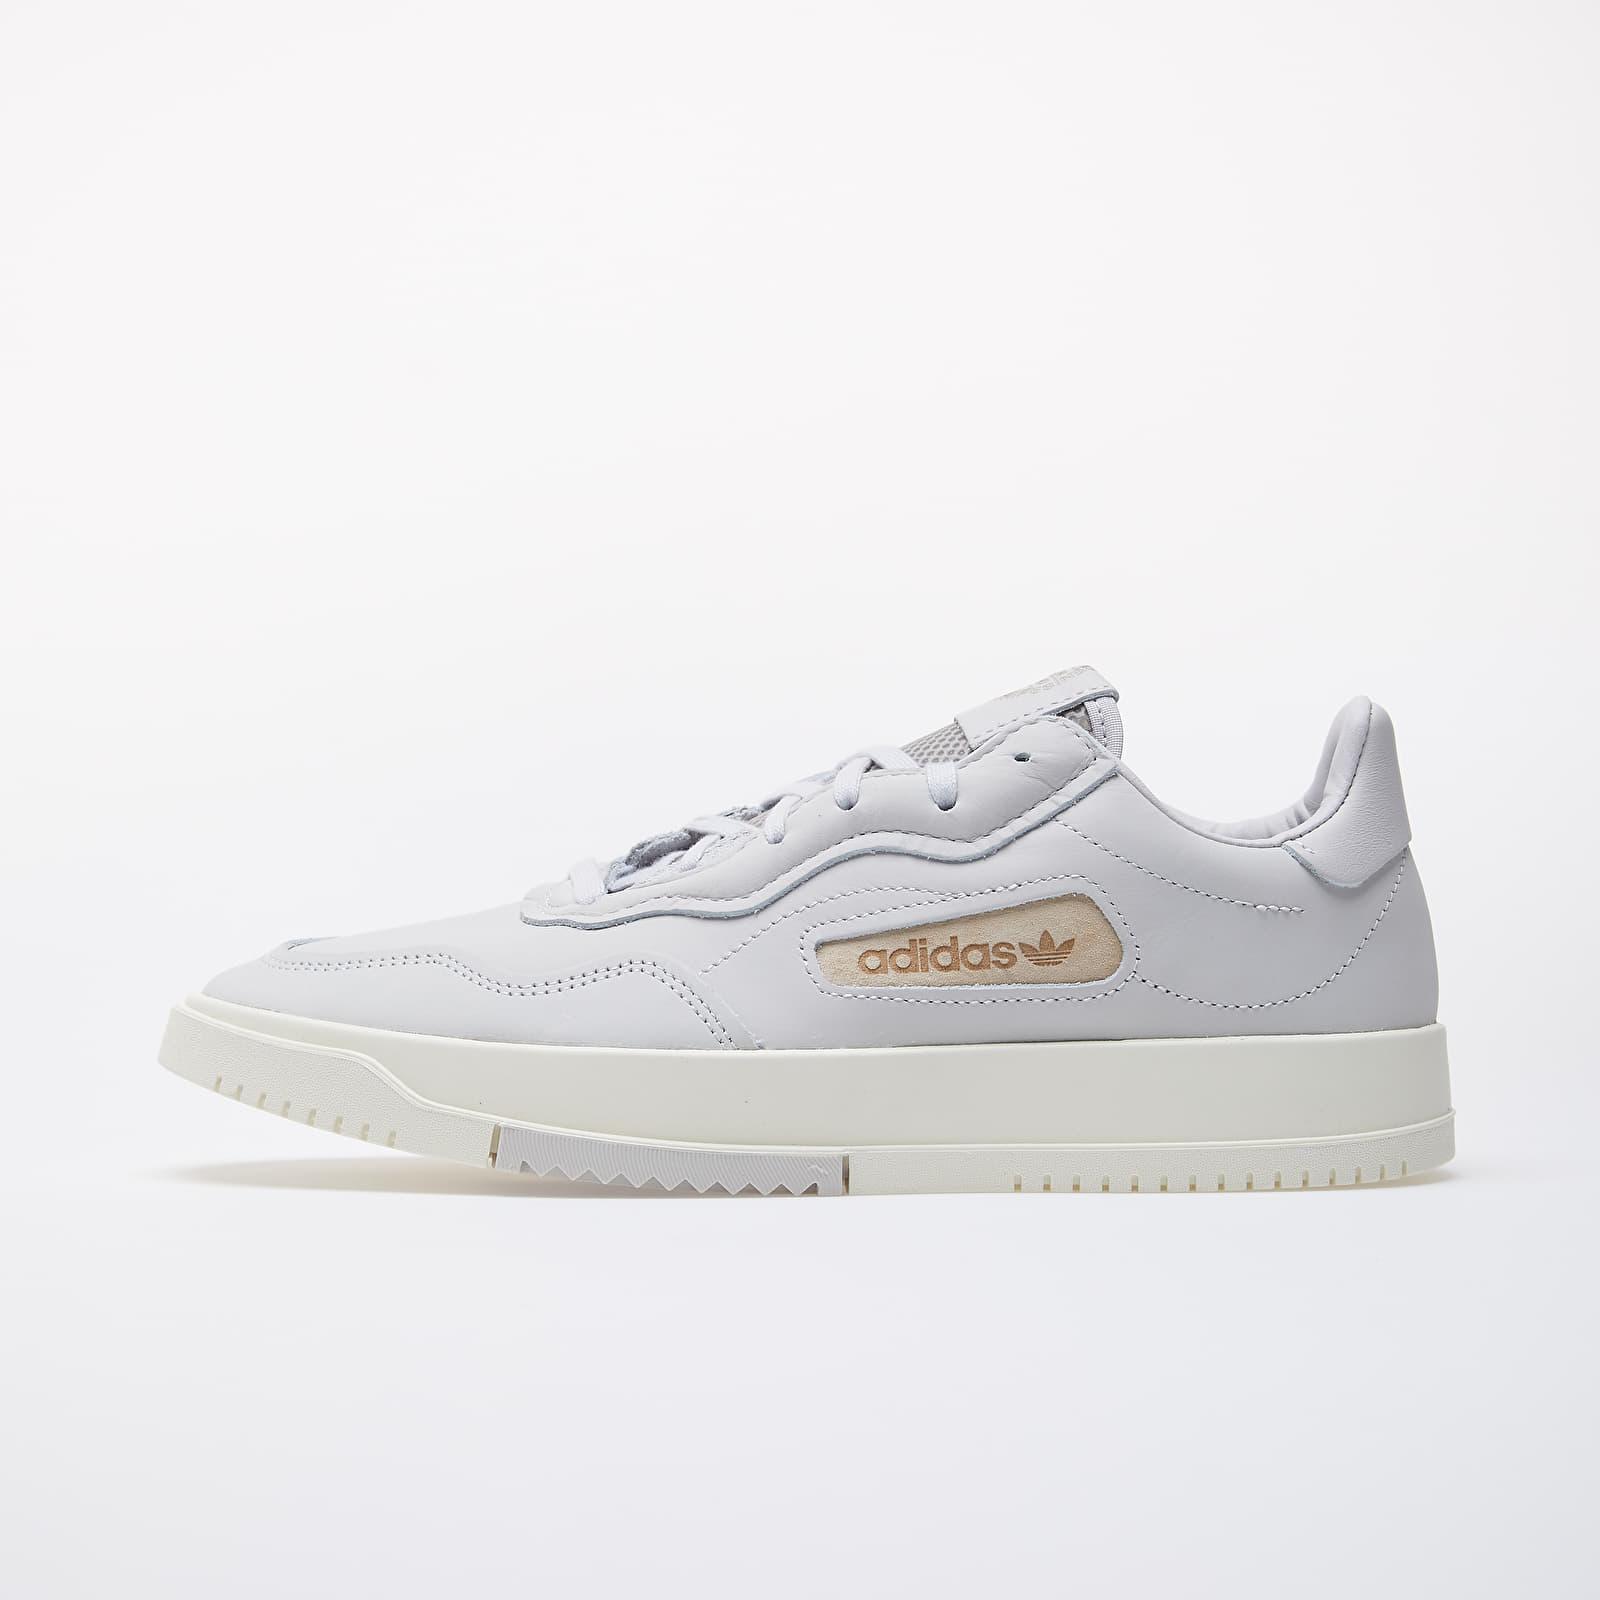 Dámské tenisky a boty adidas SC Premiere W Grey One/ Off White/ St Pale Nude